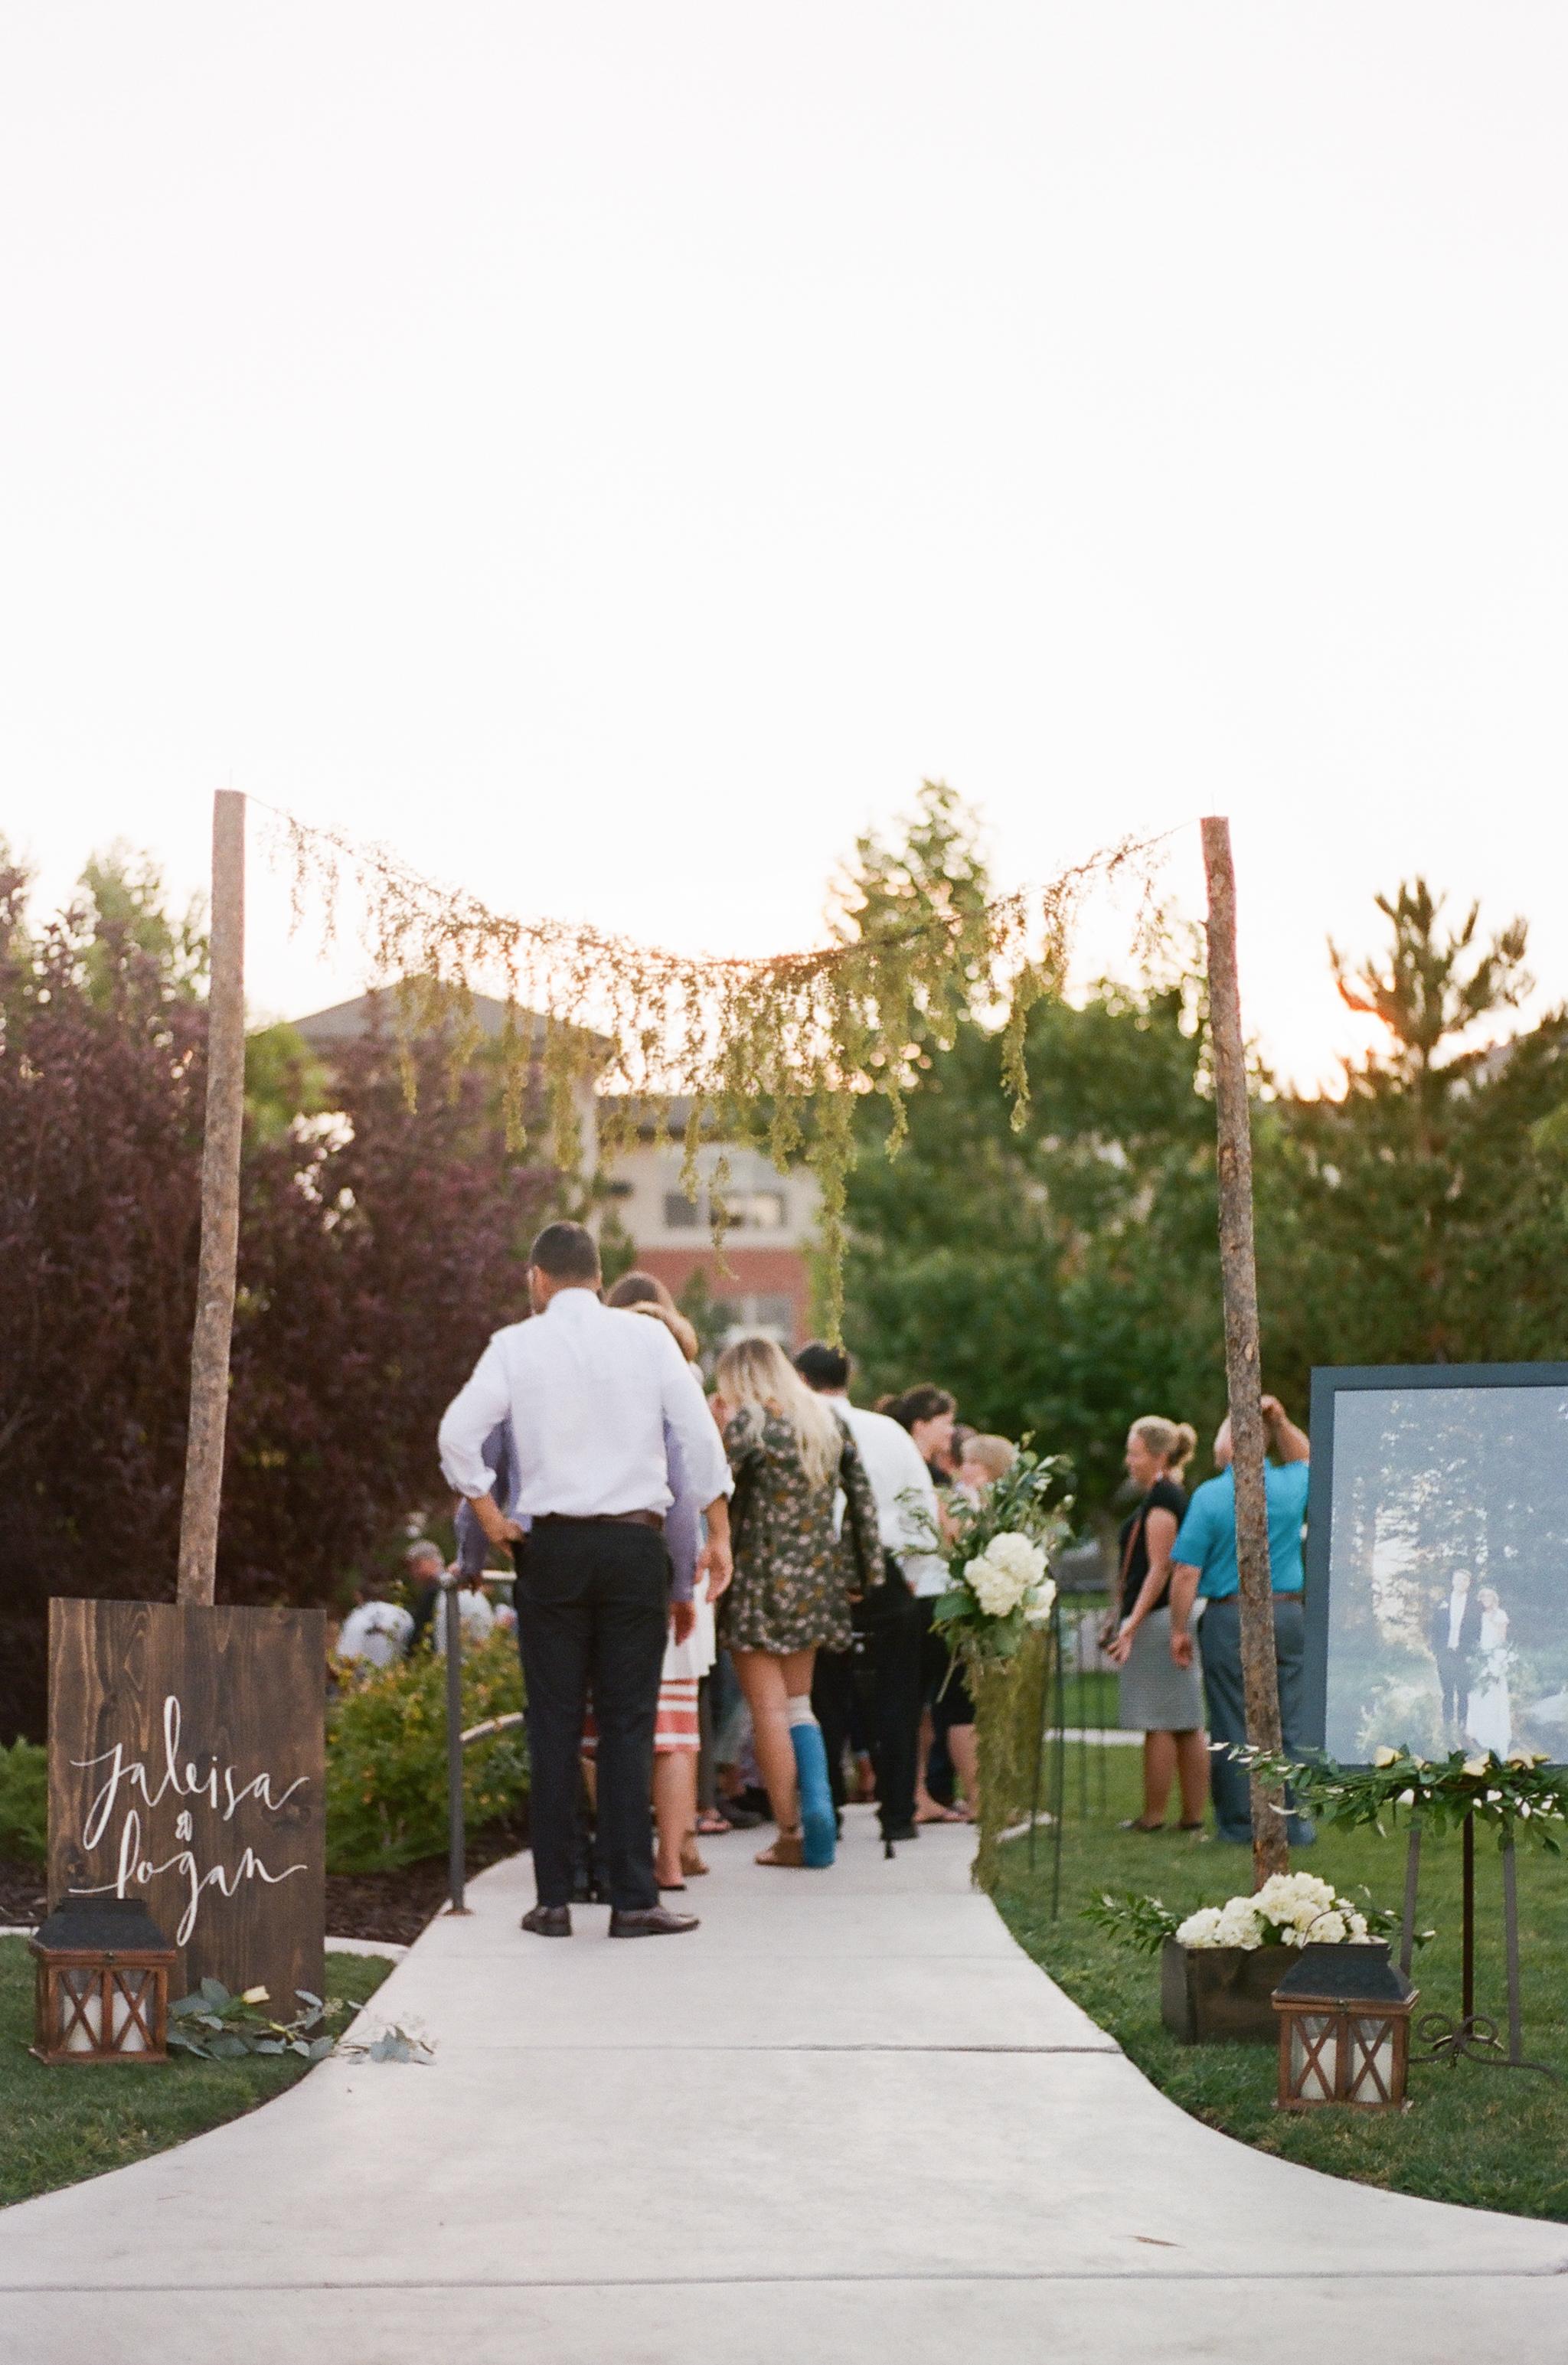 Wynona Benson Photography - Jaleisa & Logan Romantic Elegant Utah Wedding00030.jpg